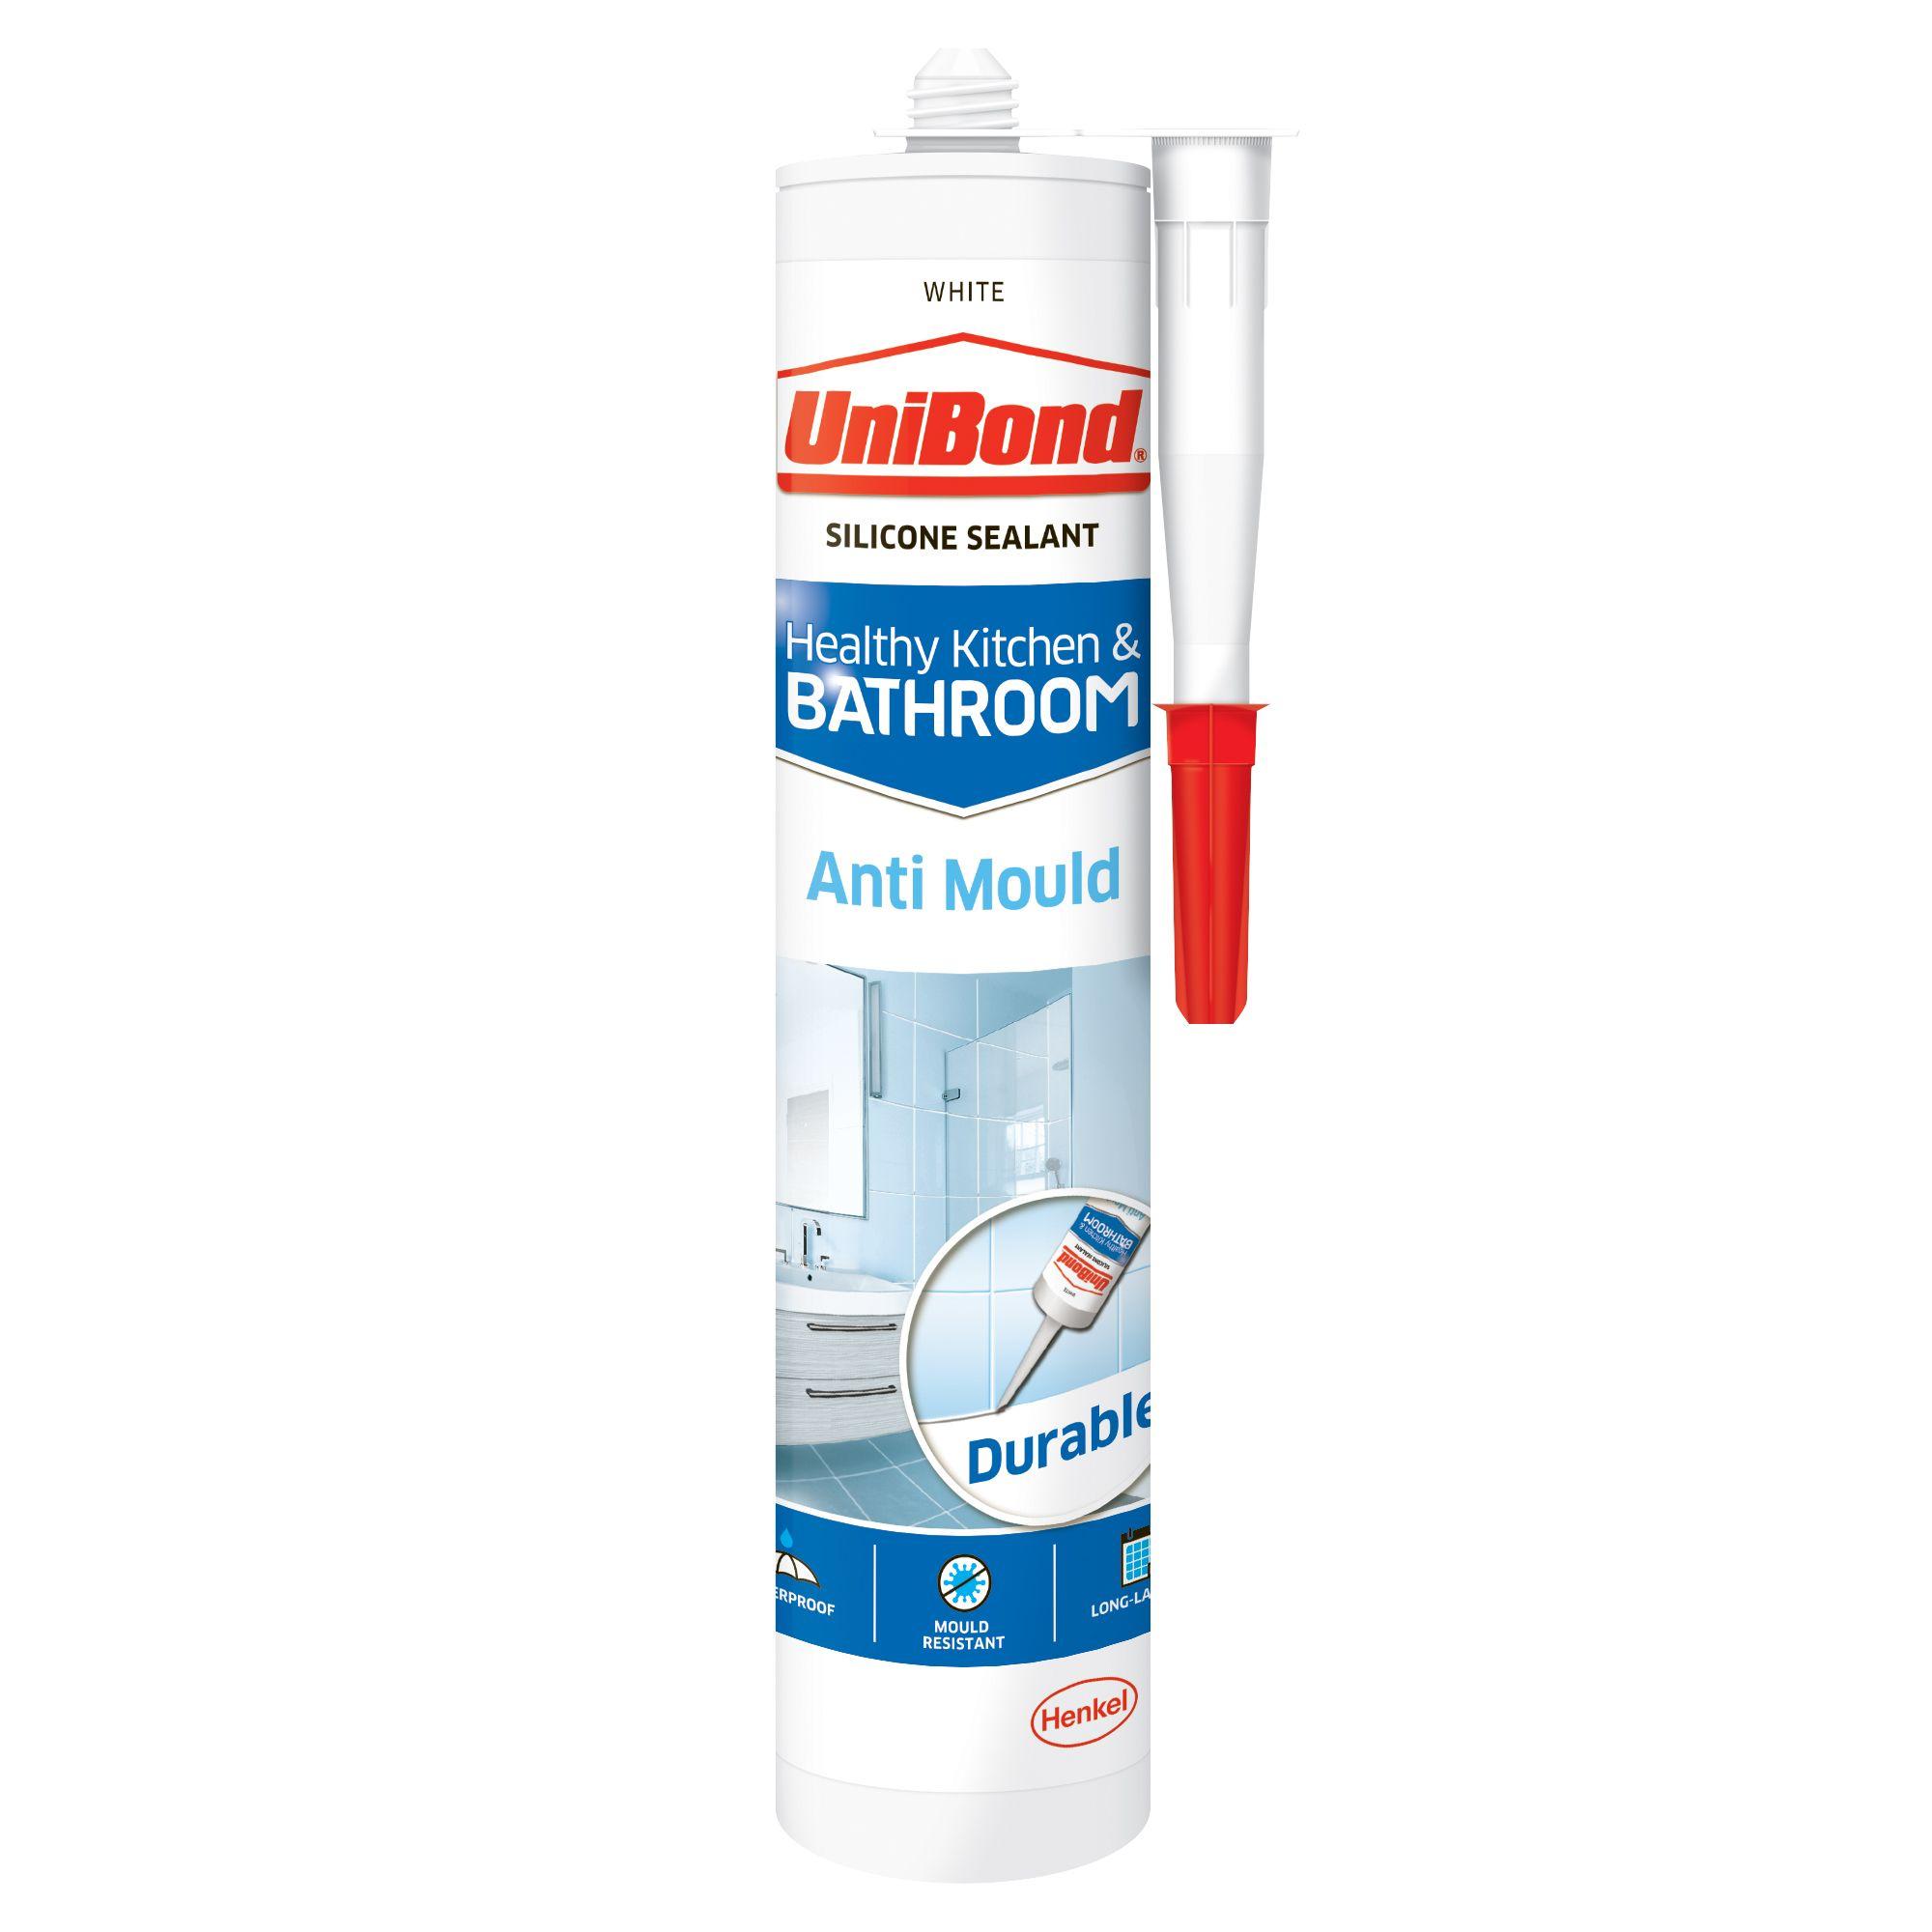 Unibond Anti Mould White Kitchen Bathroom Sealant 300 Ml